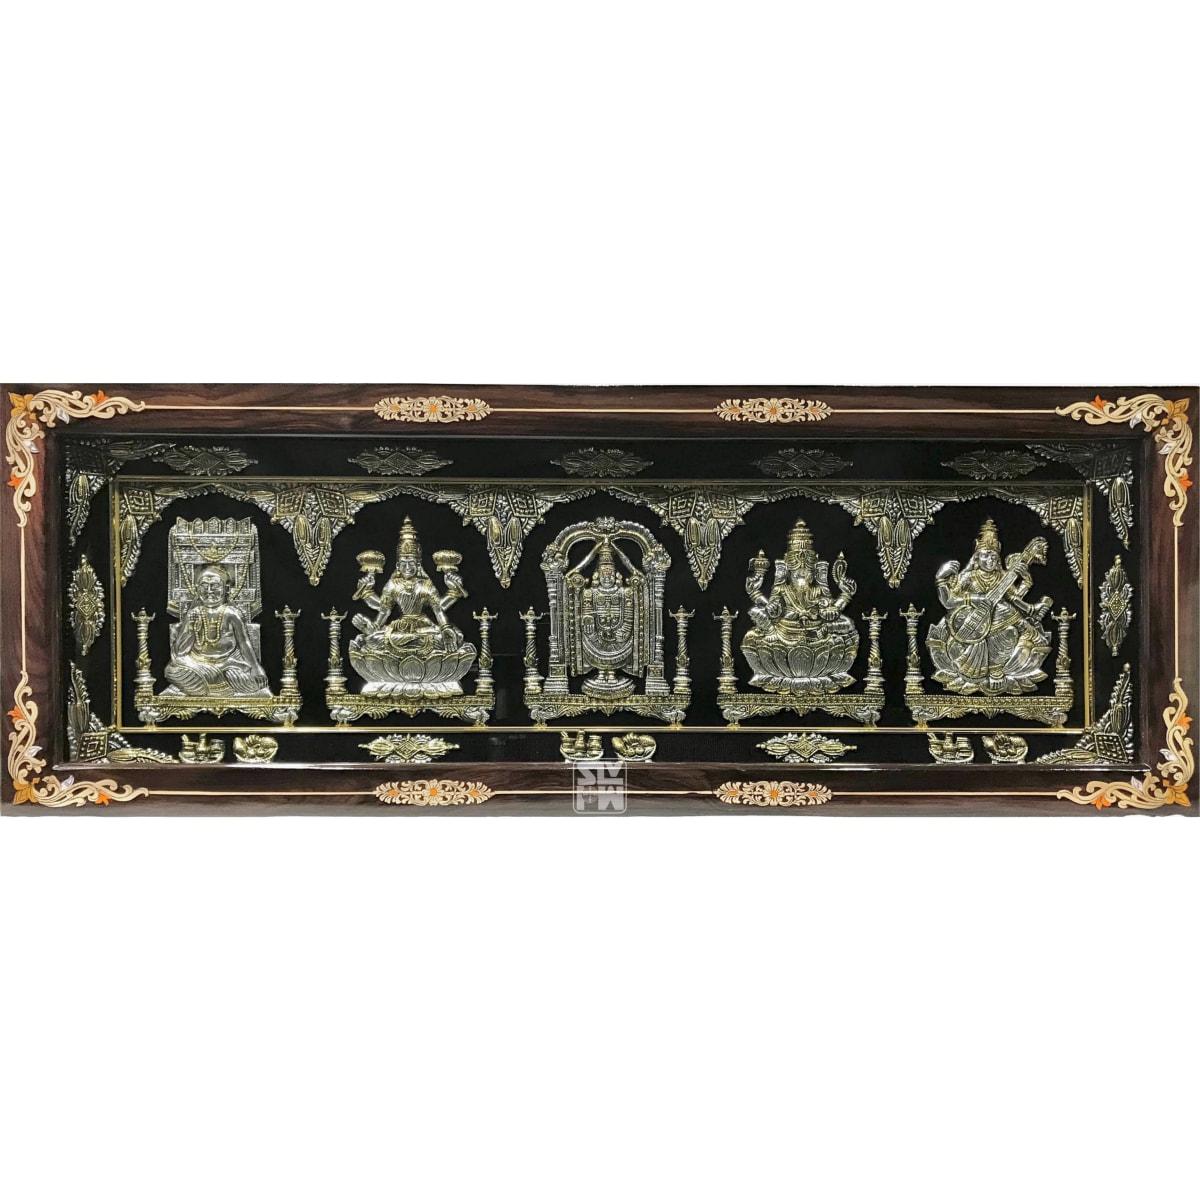 15x41 Raghavendra Lakshmi Balaji Ganesha Saraswati Antique Finish